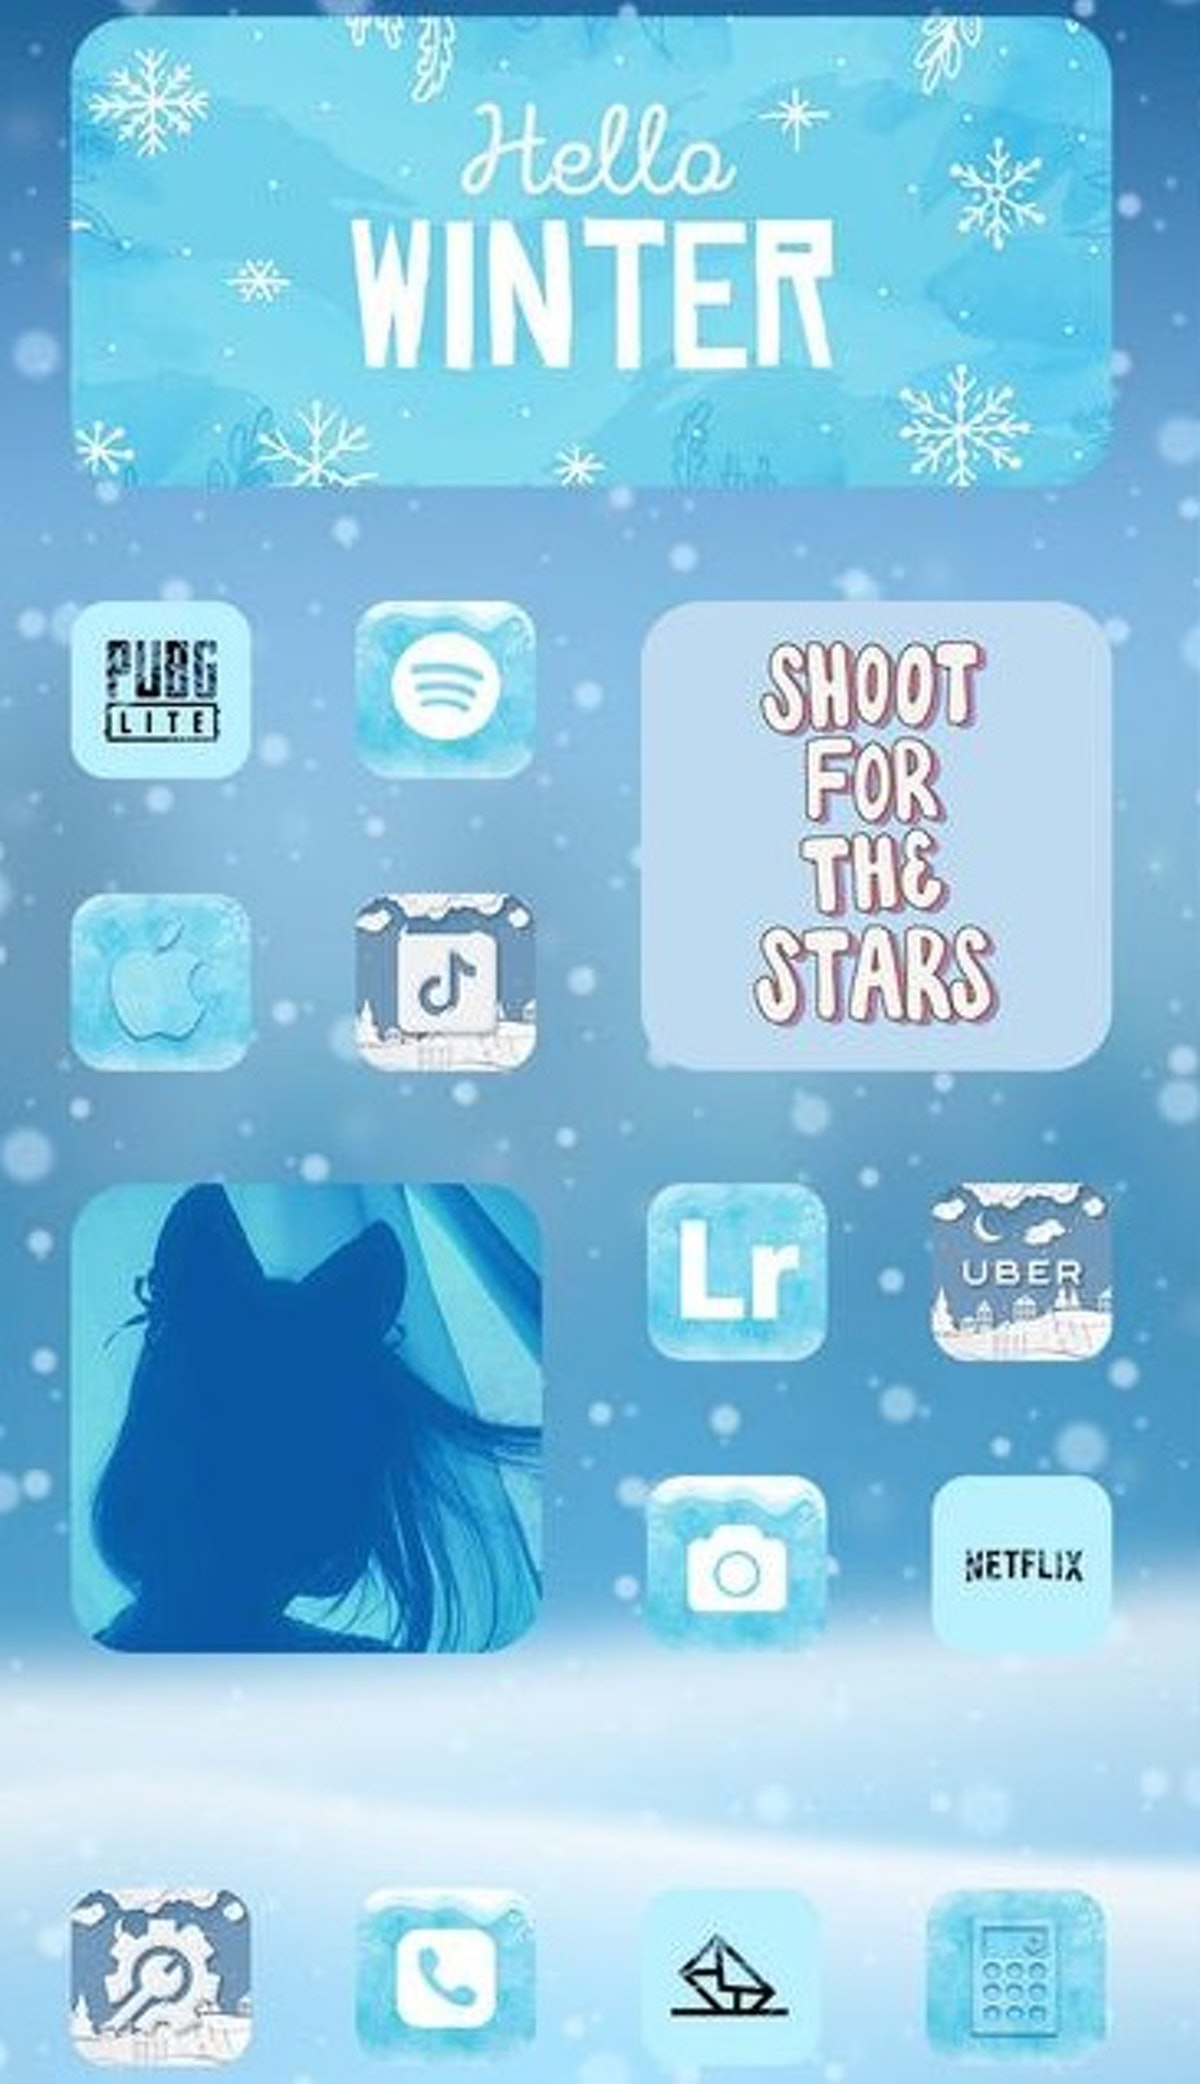 Winter Aesthetic iOS 14 Home Screen Design